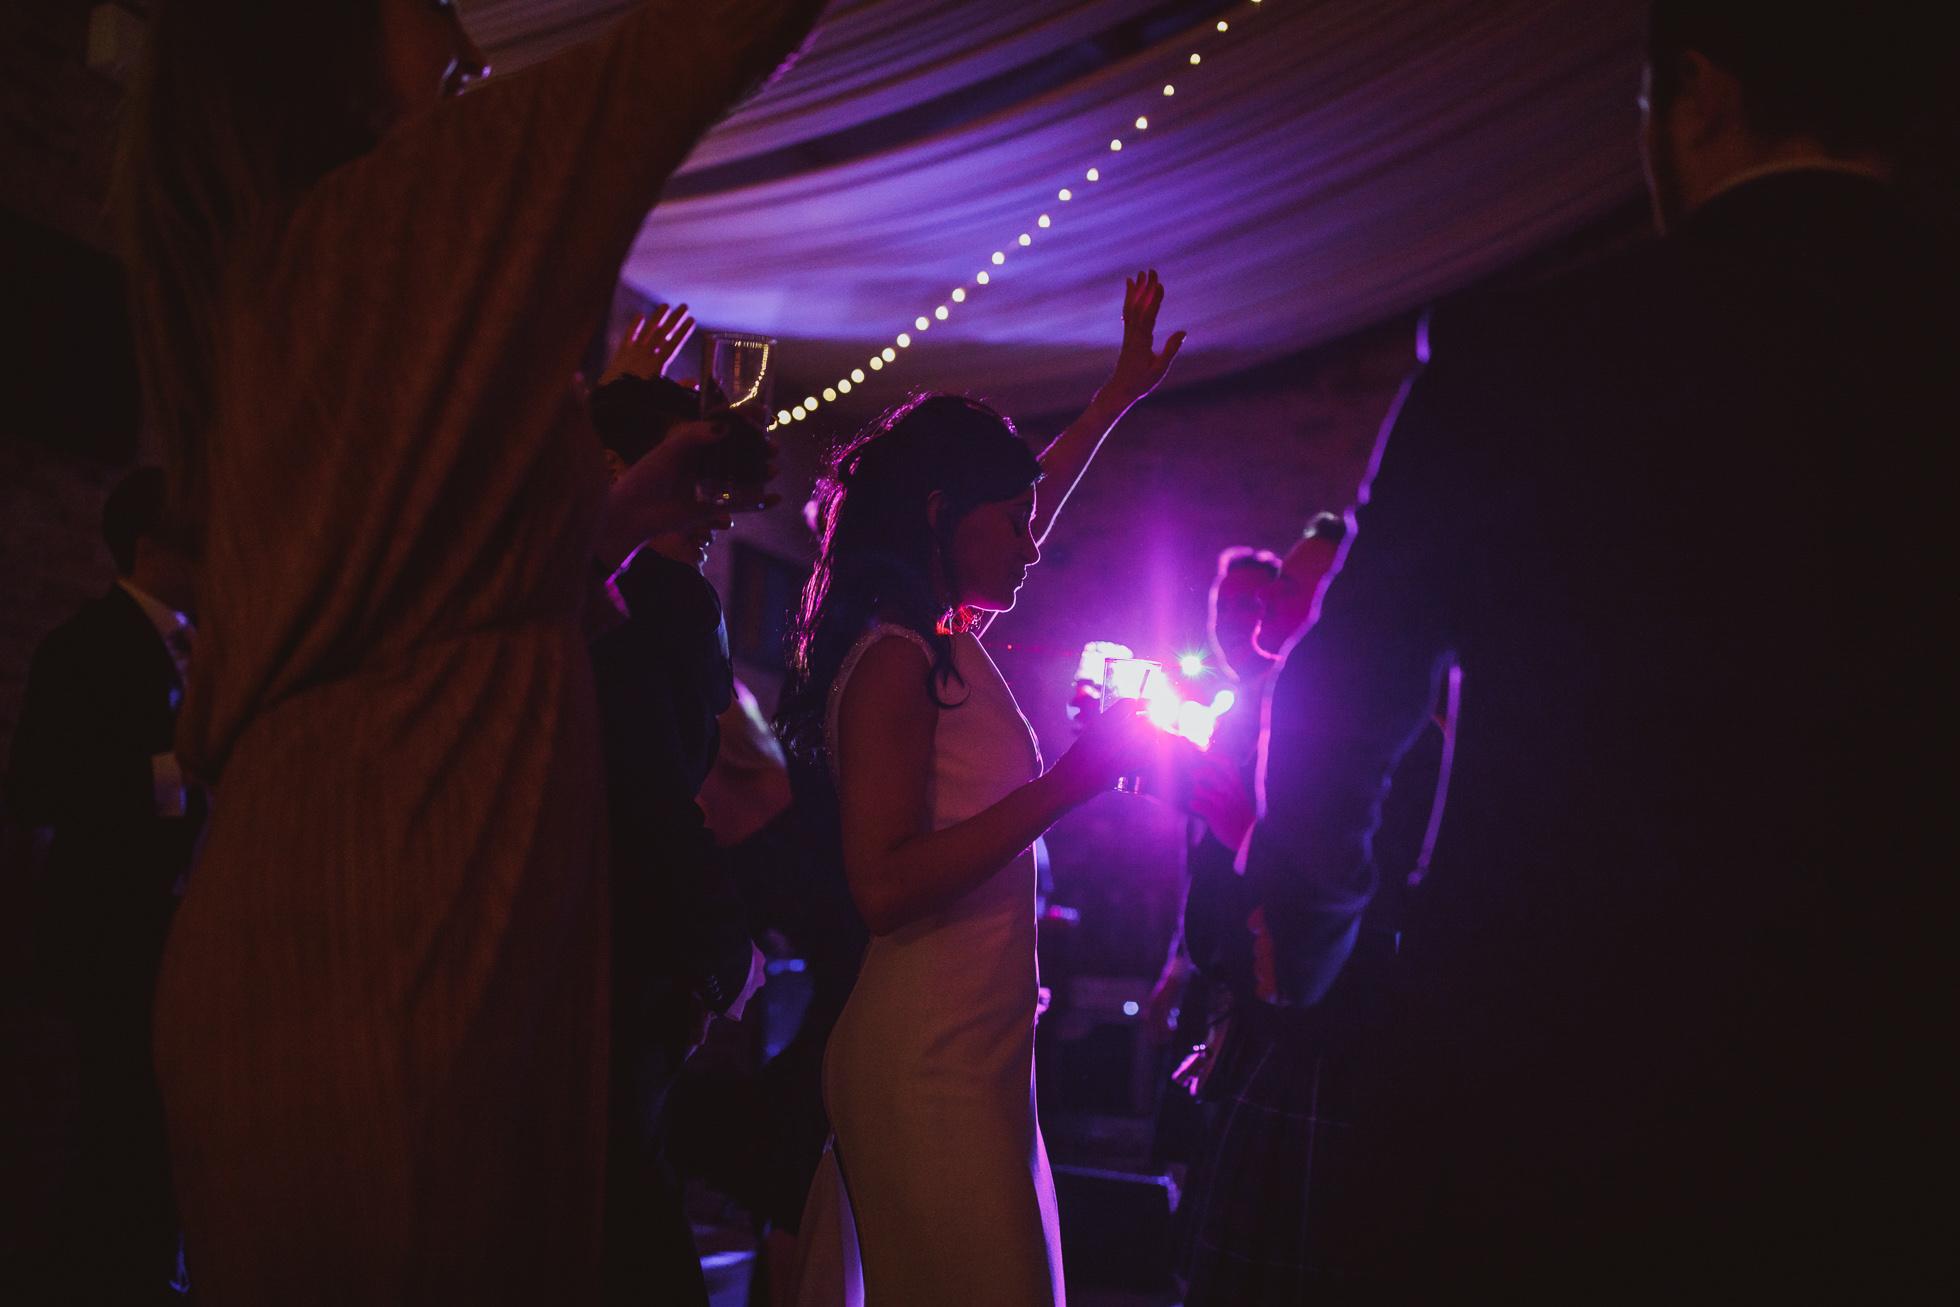 hornington_manor_wedding_photographer-152.jpg